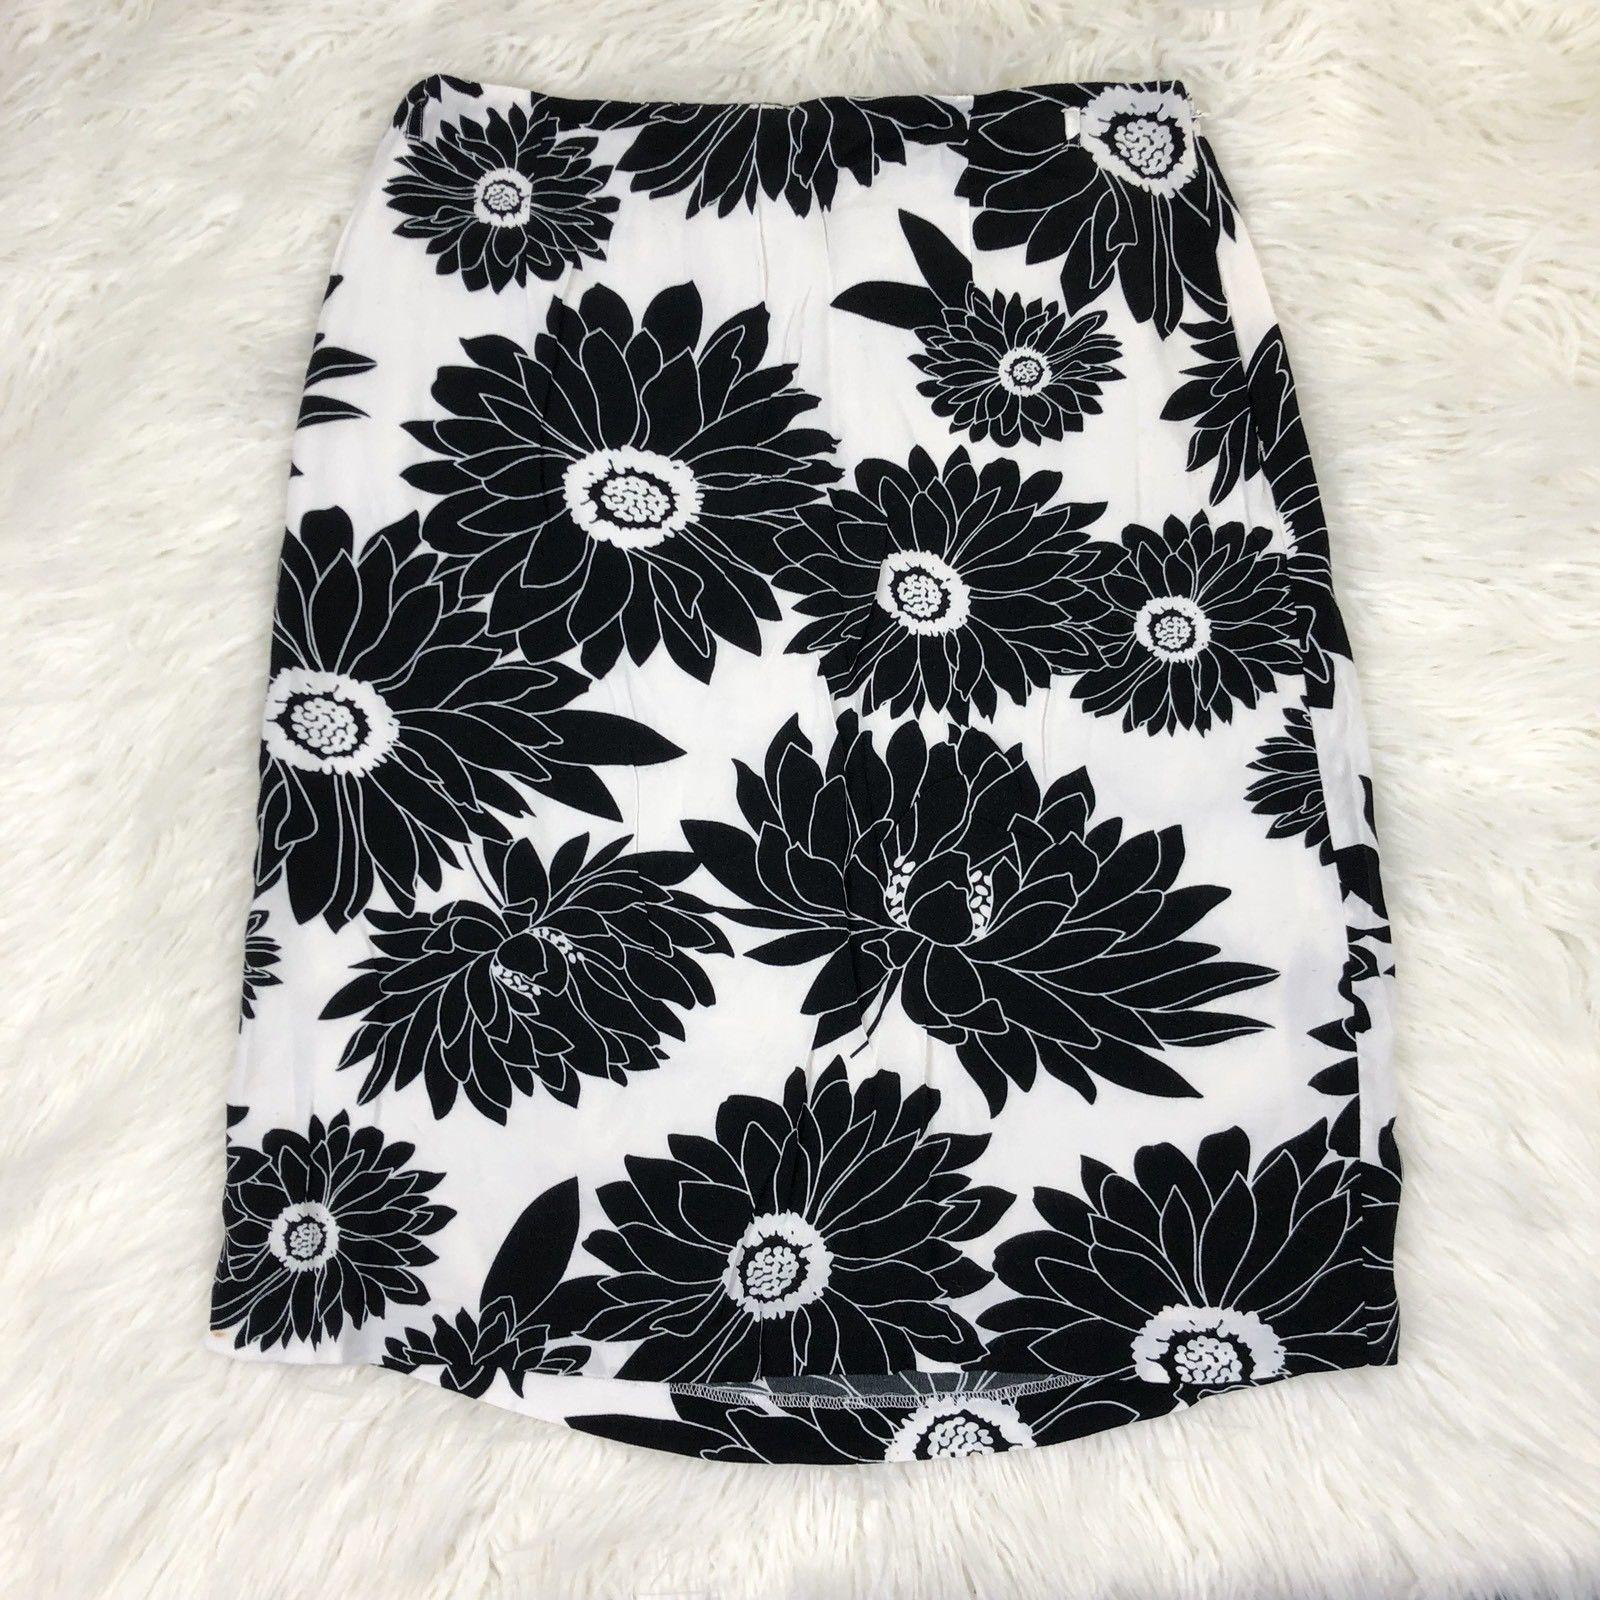 25169e045b Ann Taylor Loft Women's Size 10 White Black and 49 similar items. S l1600